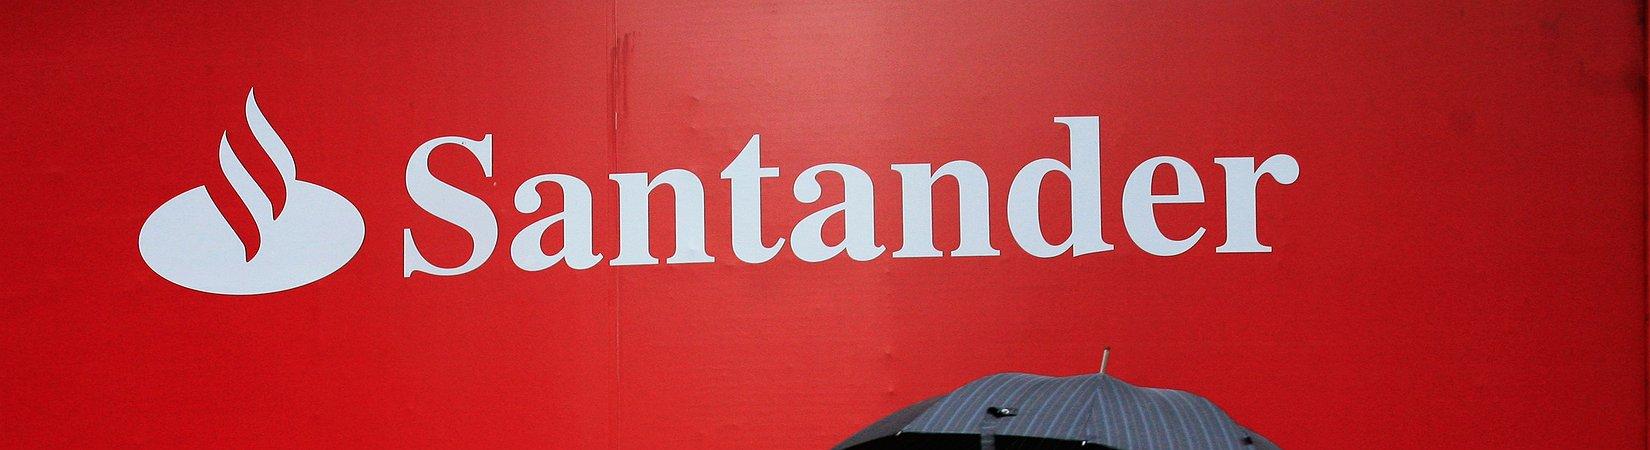 Banco Santander: Банк, который стал блокчейн-пионером.